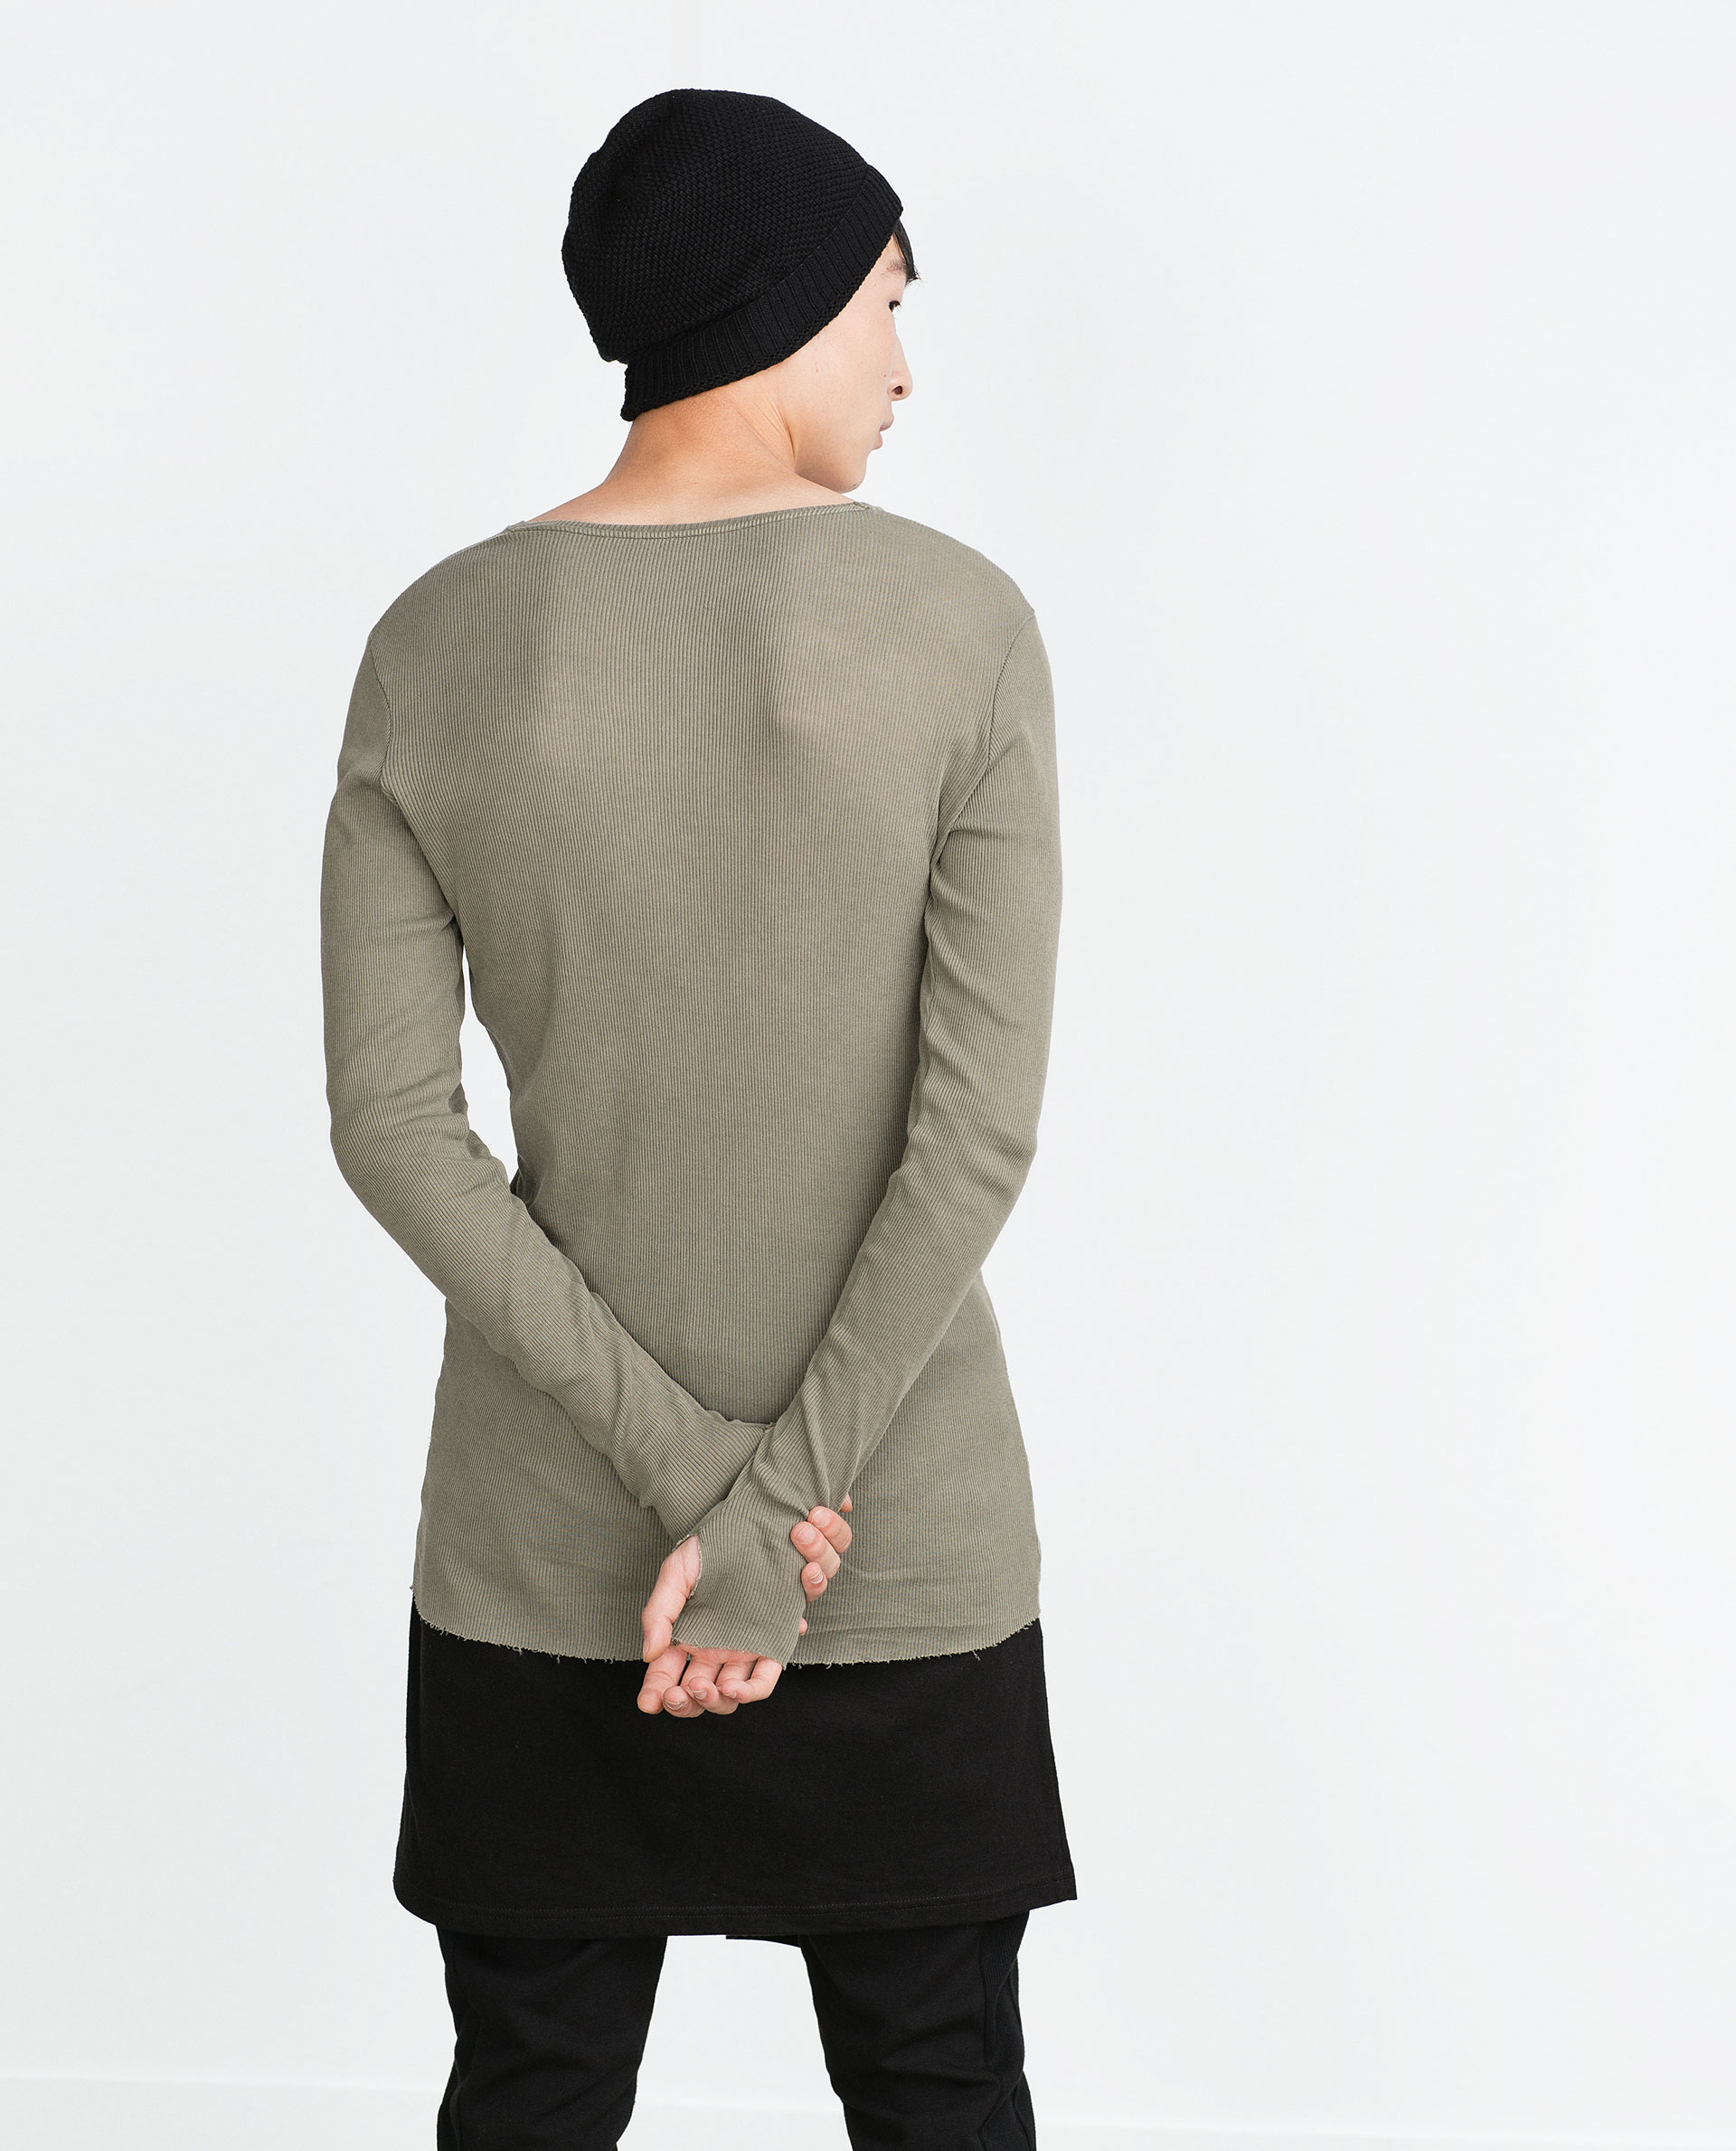 Zara dark ribbed t shirt in khaki for men lyst for Zara mens shirts sale